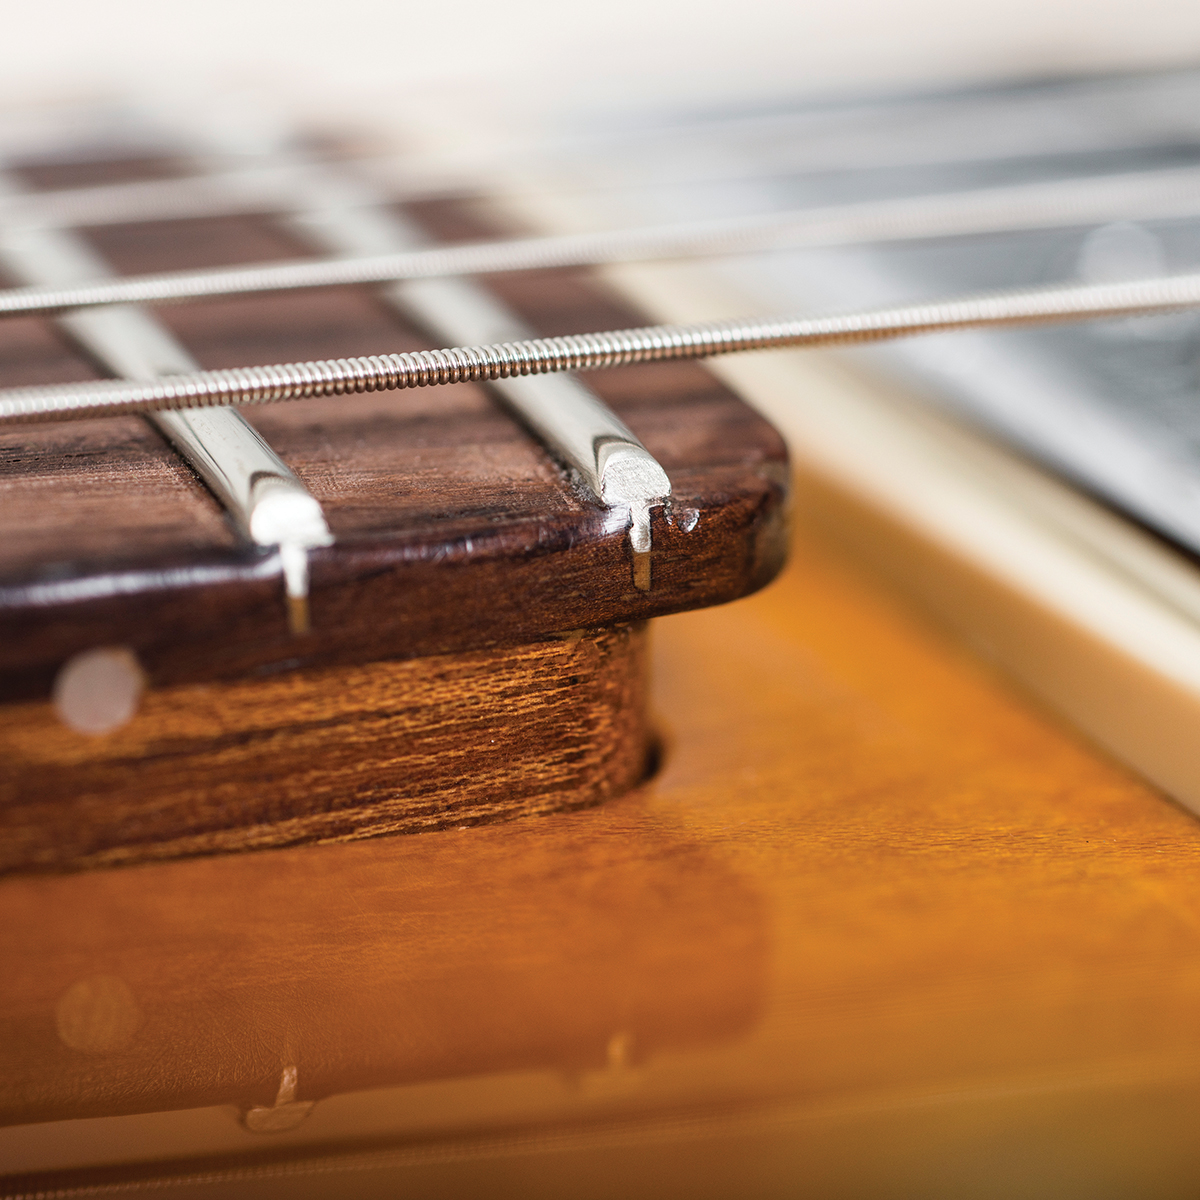 Parallel Lines: Fender 2018 Troublemaker Telecaster